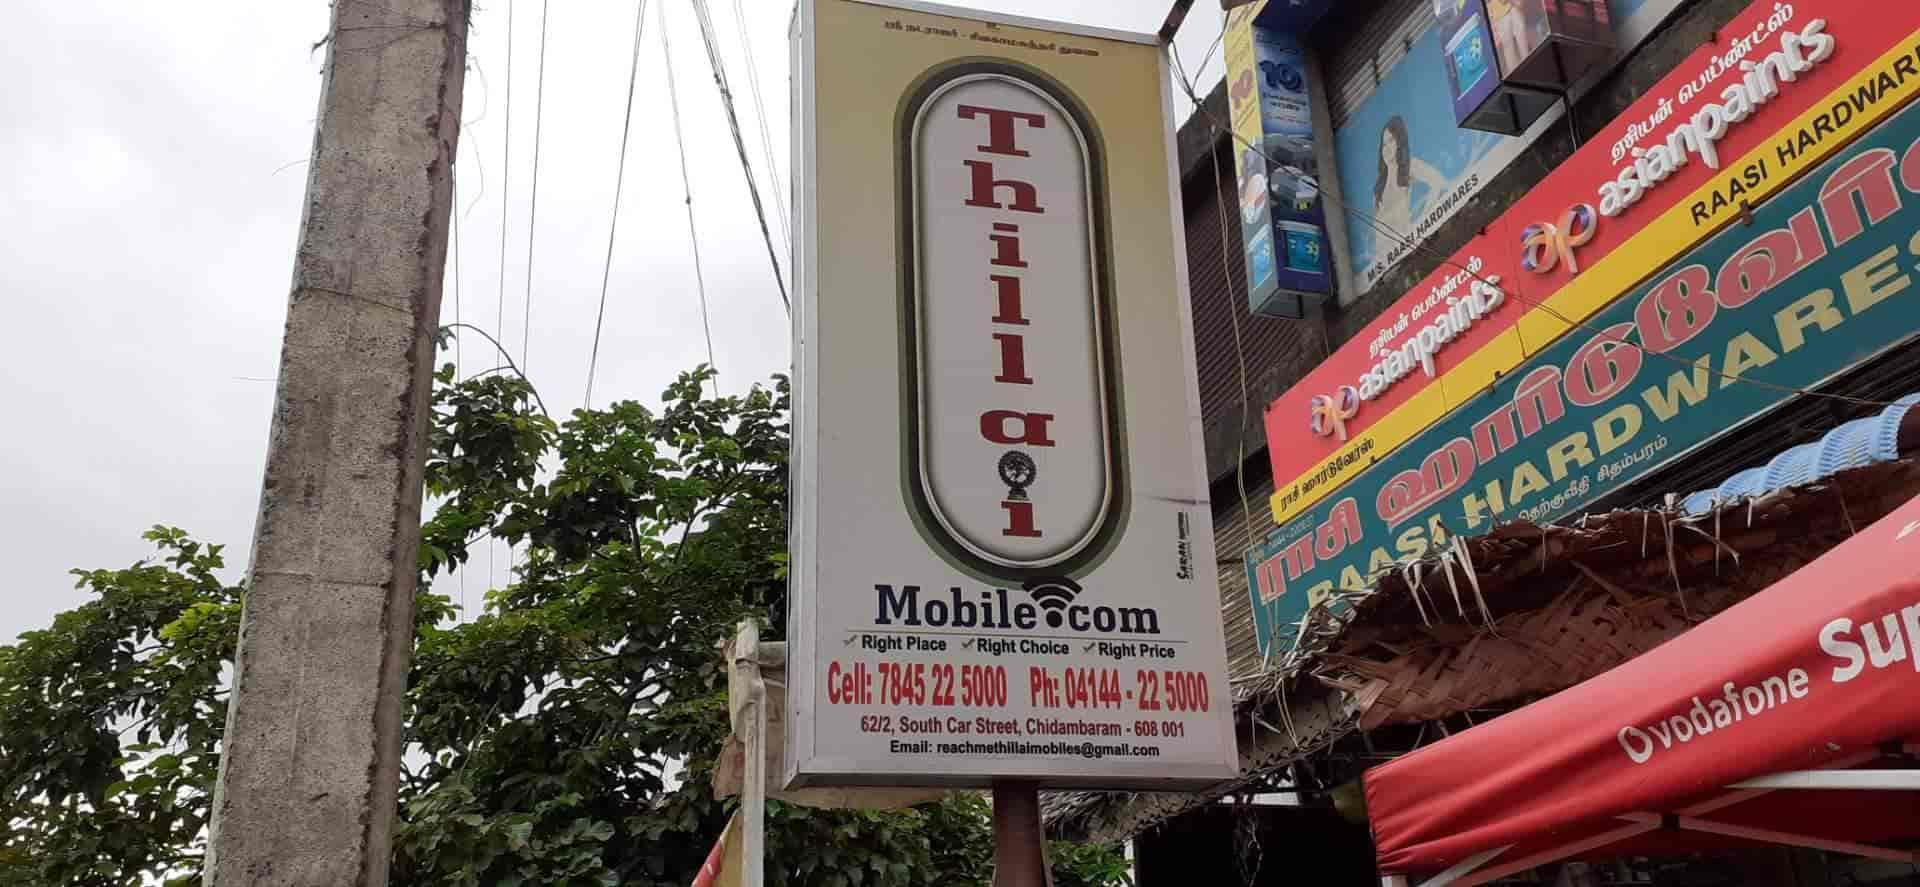 Thillai Mobile com, Chidambaram HO - Mobile Phone Dealers in